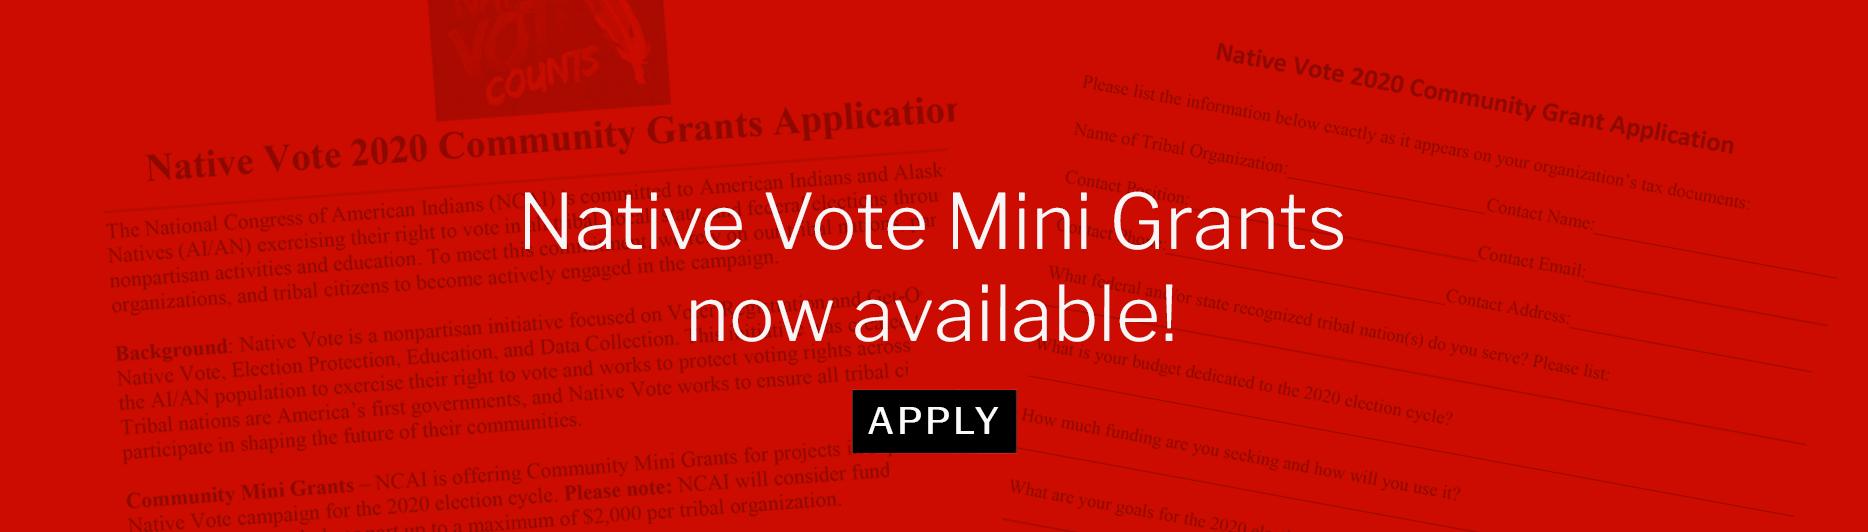 Native Vote Mini Grants now available